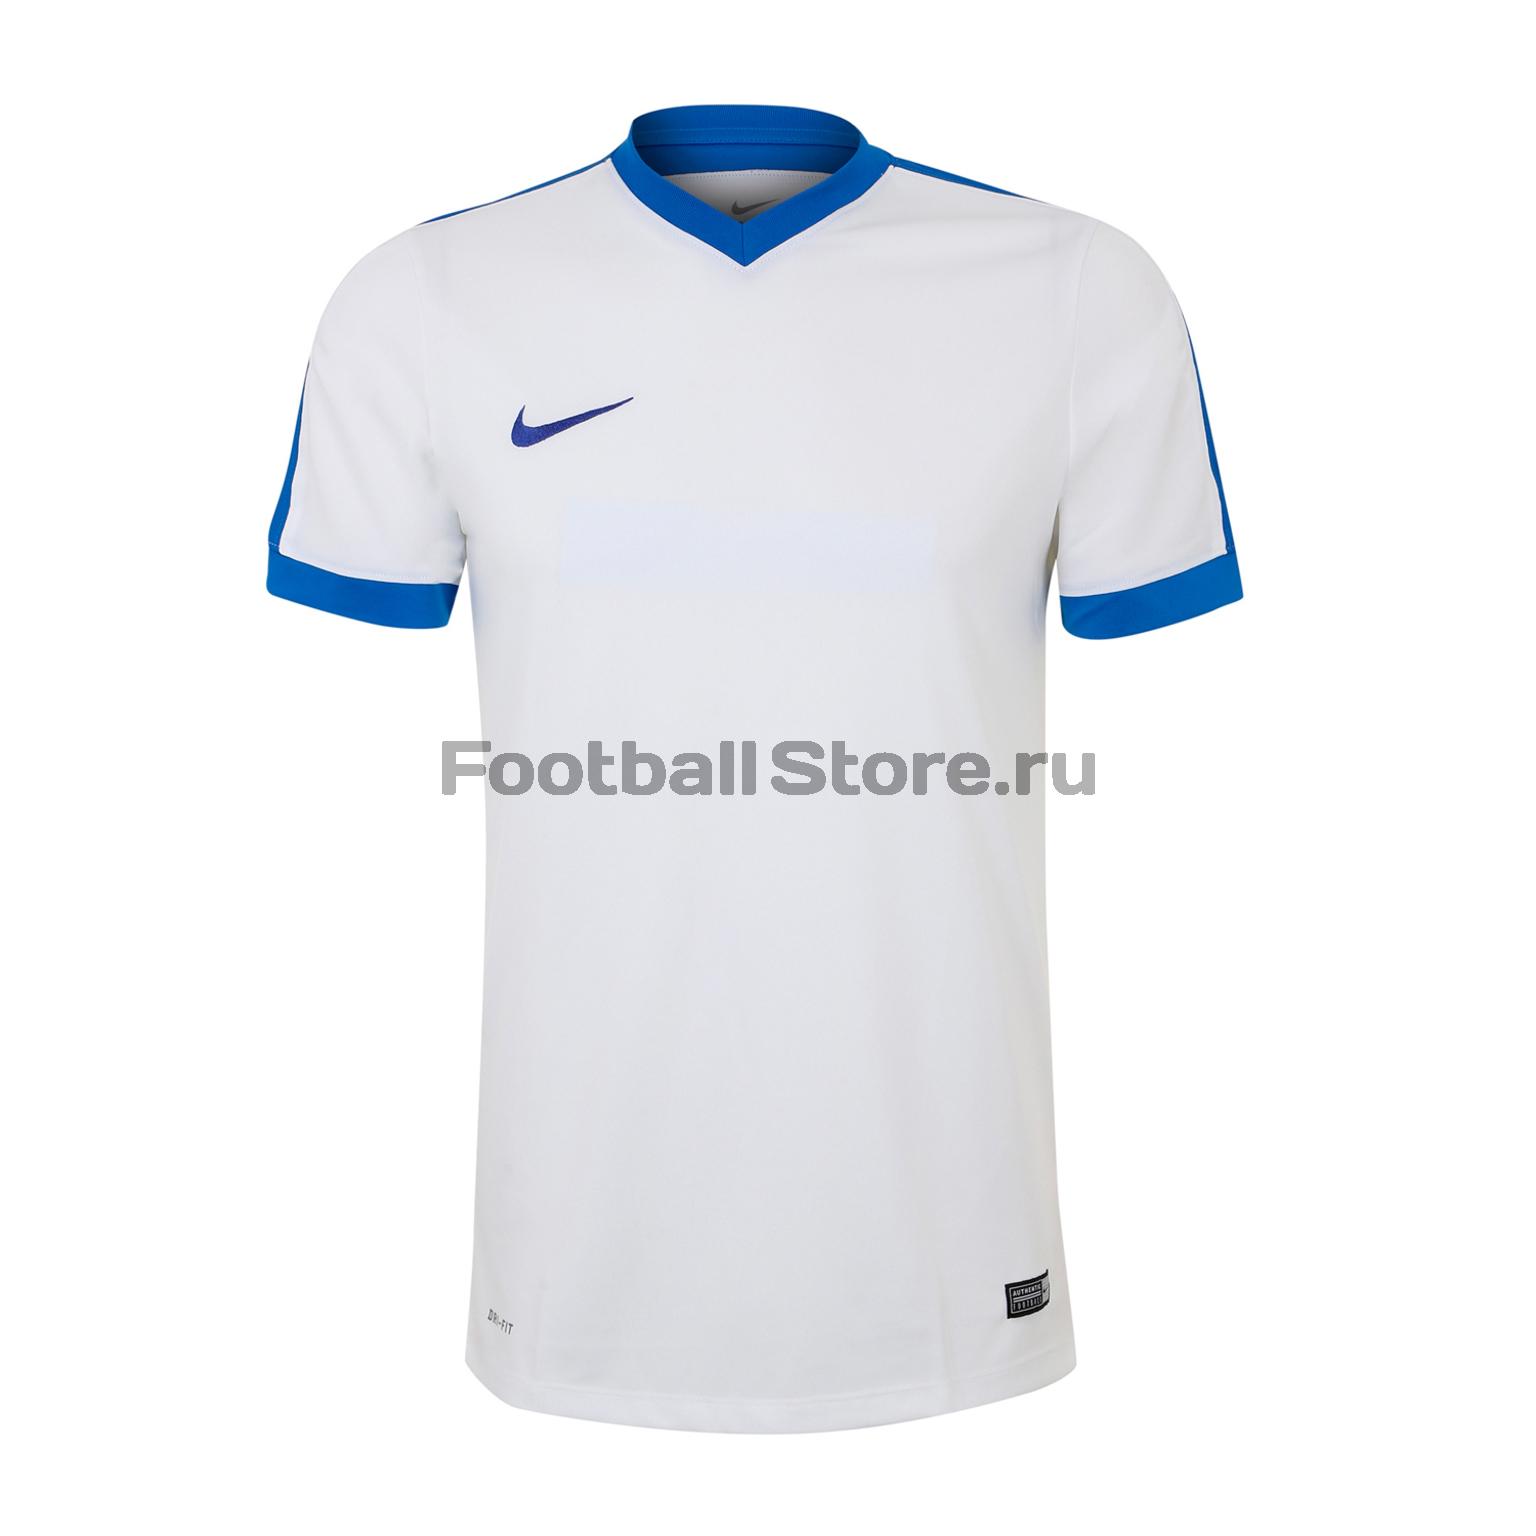 Игровая форма Nike Футболка Nike SS YTH Striker IV JSY 725974-100 футболки nike футболка игровая nike ss precision iv jsy 832975 100